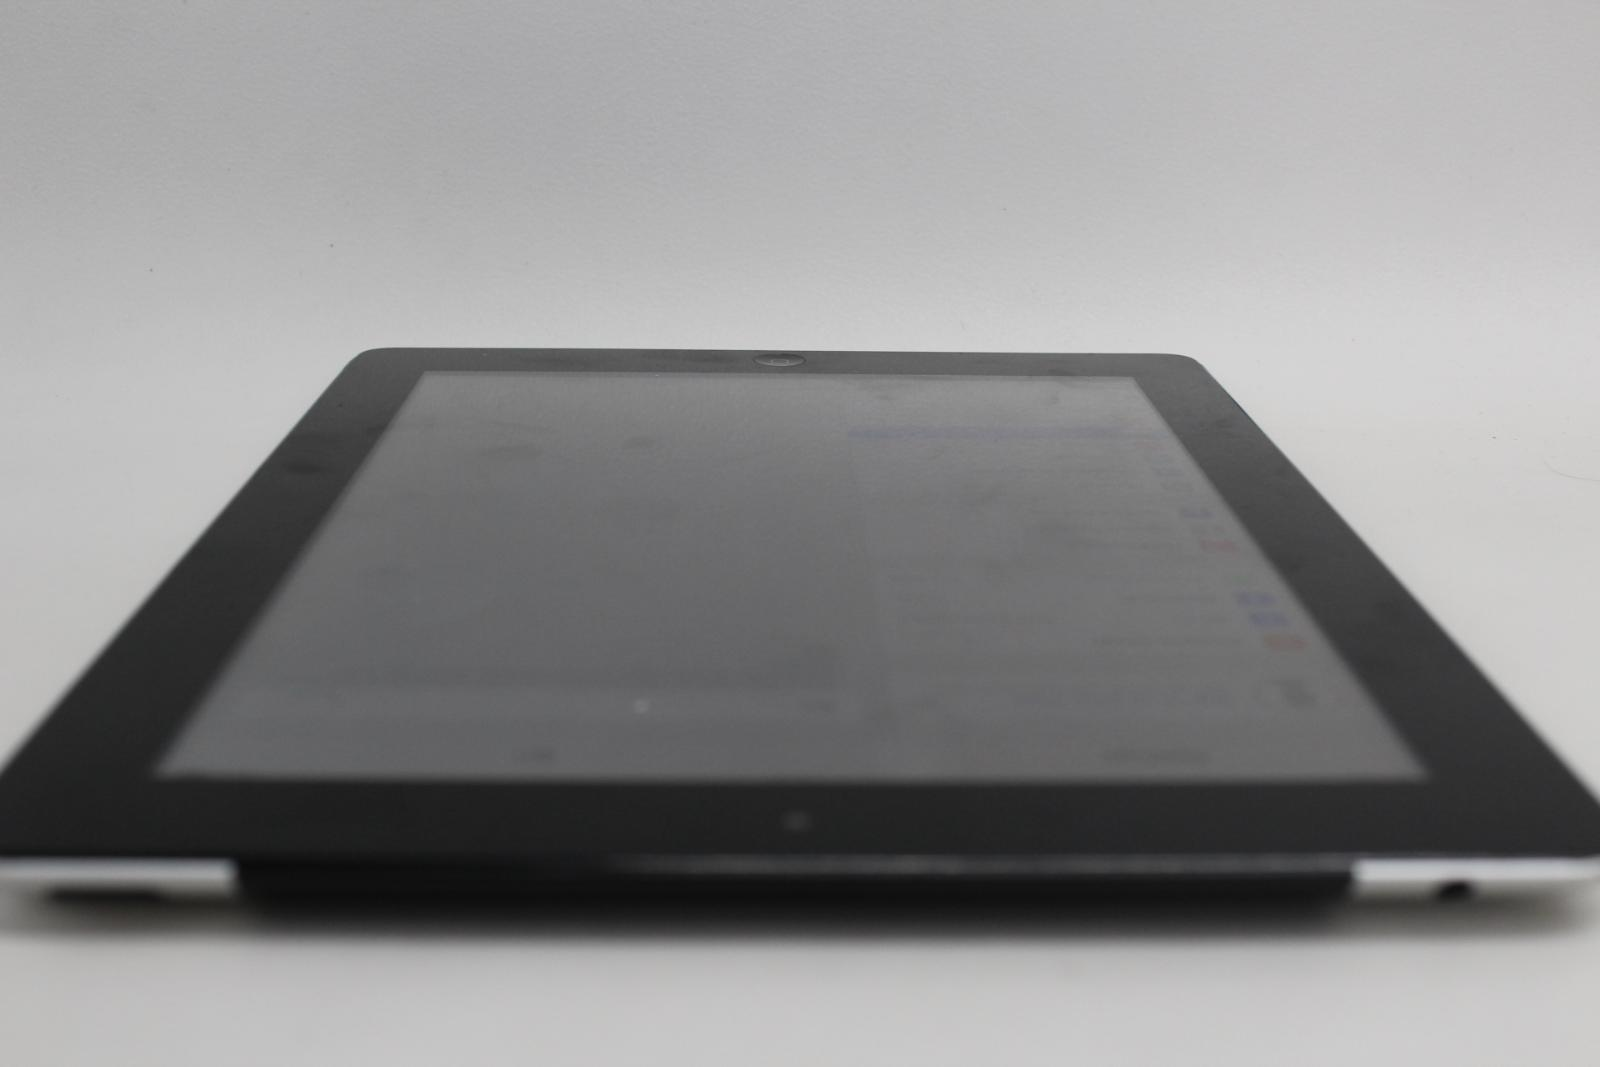 APPLE-iPad-4th-Gen-Tablet-9-7-inch-122-94GB-Black-Bezel-Wi-Fi-Model-A1460 thumbnail 6